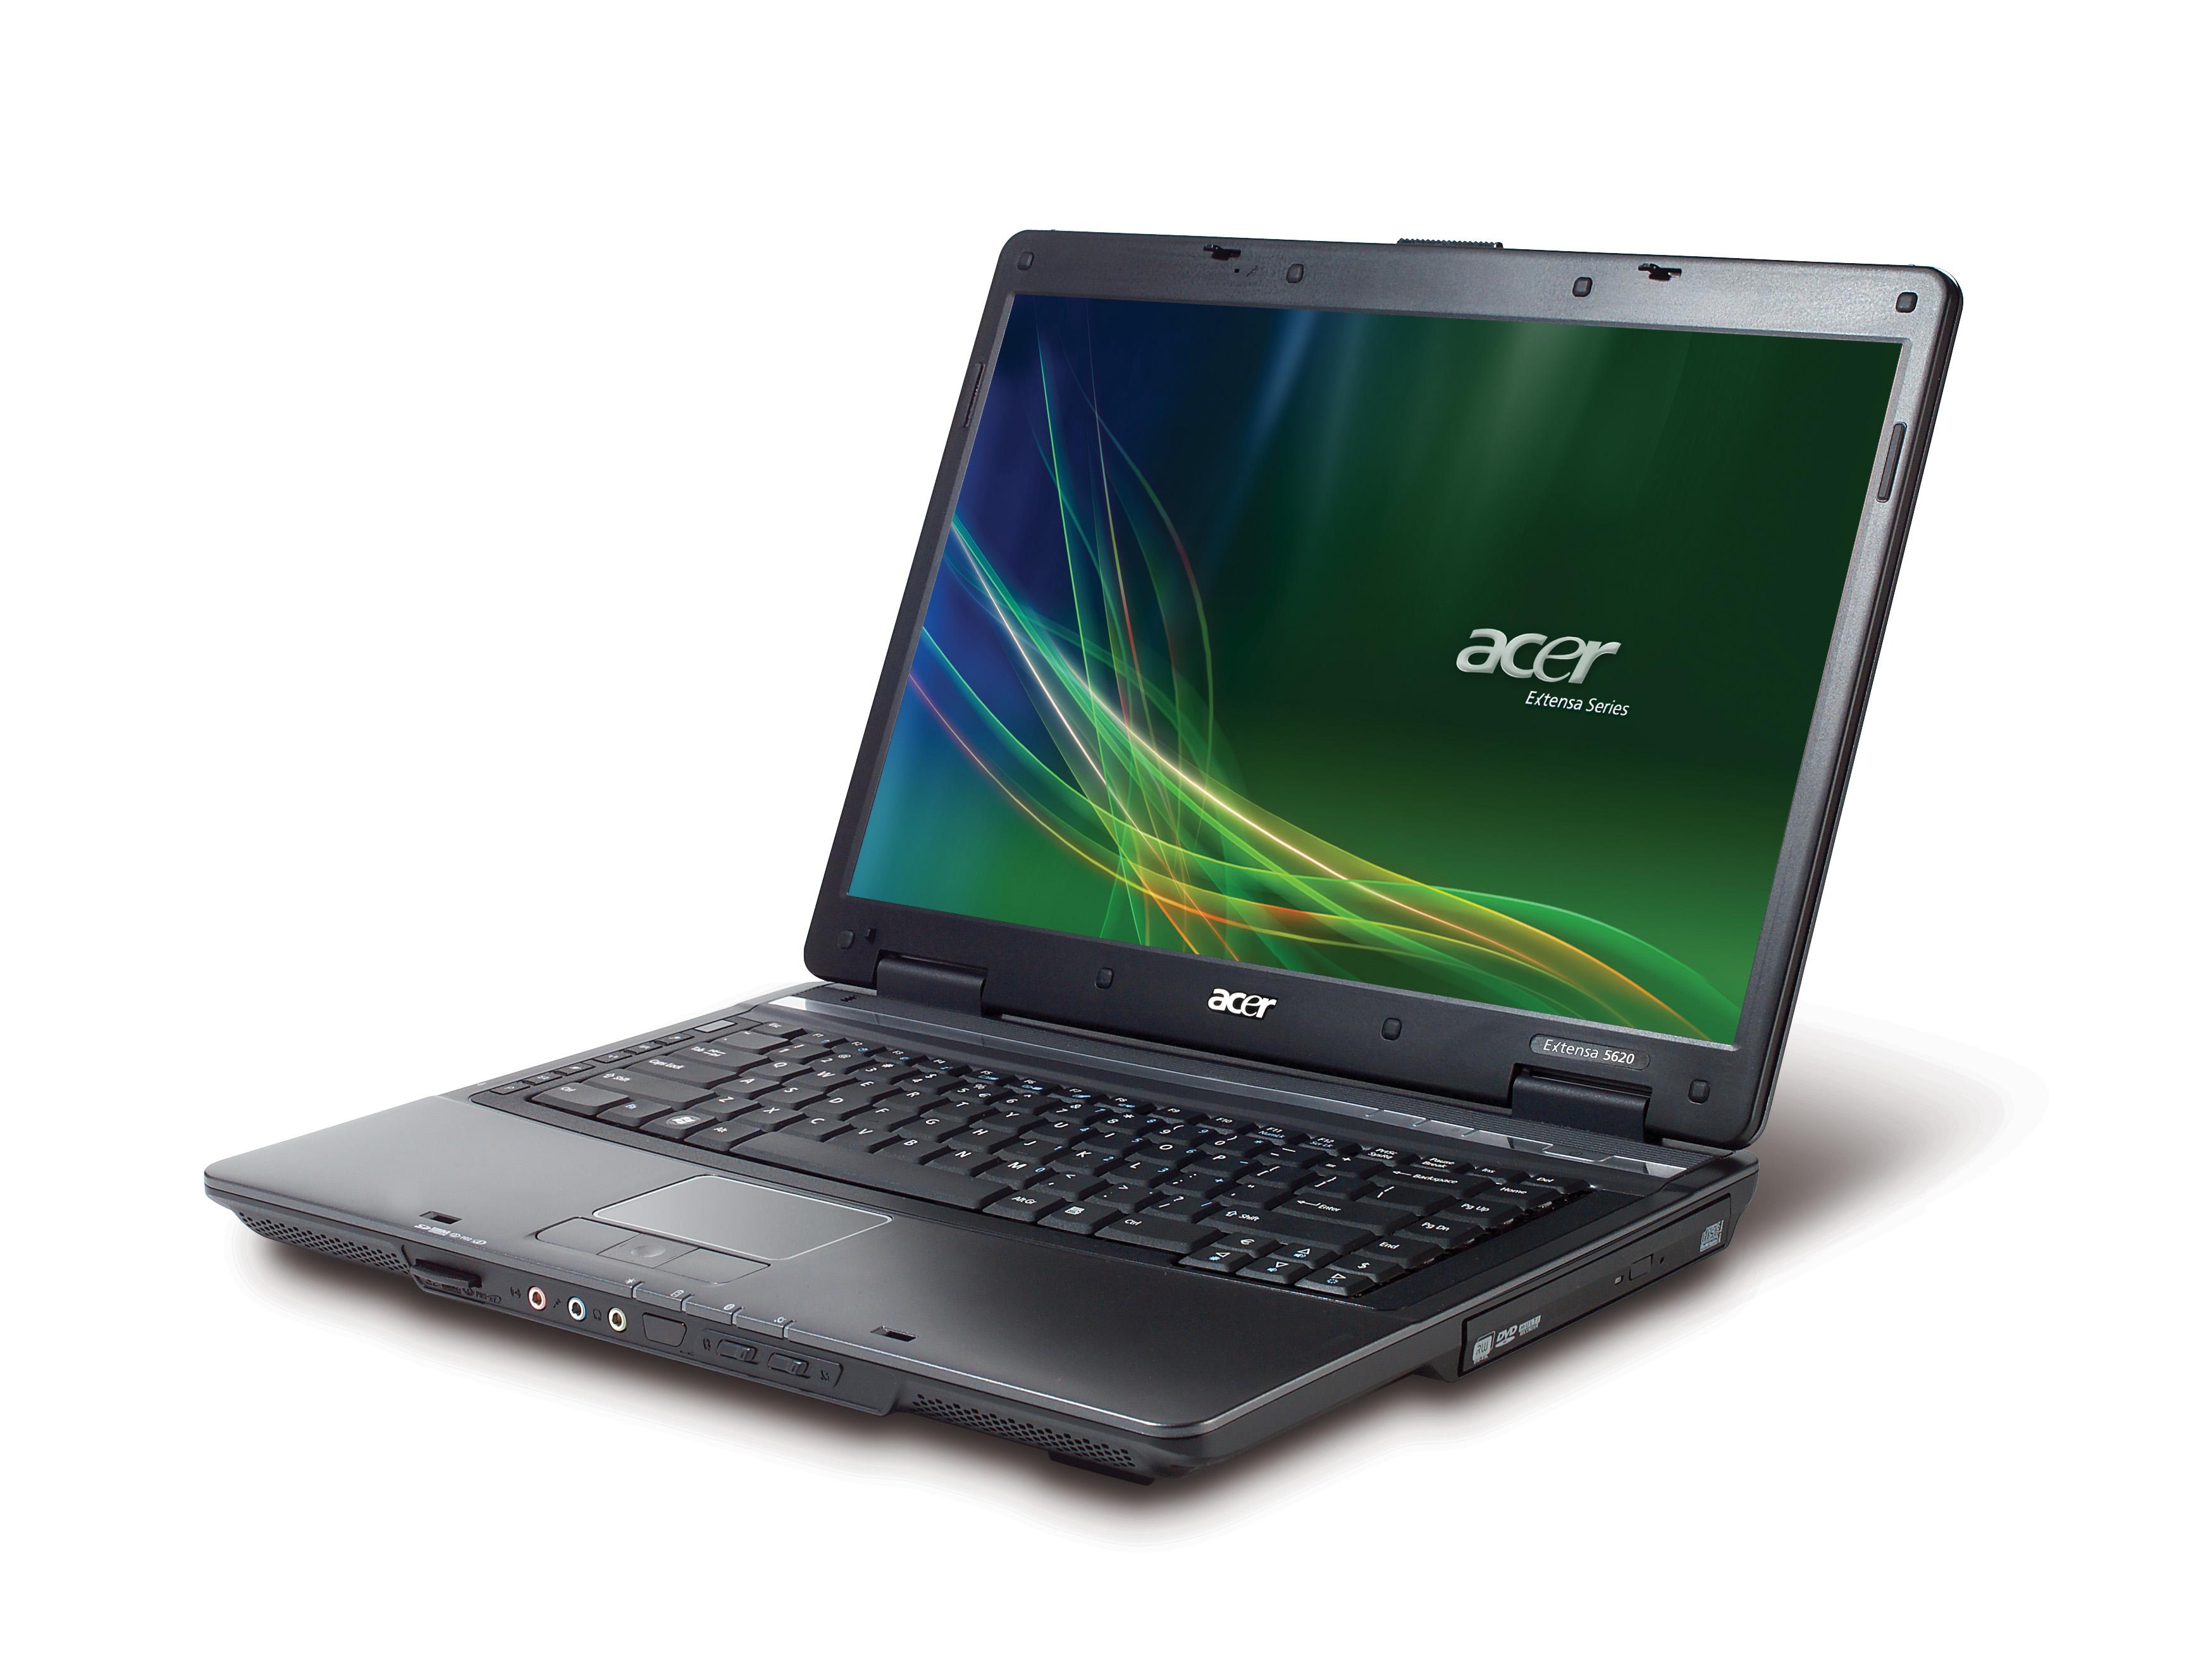 Acer Extensa 2000